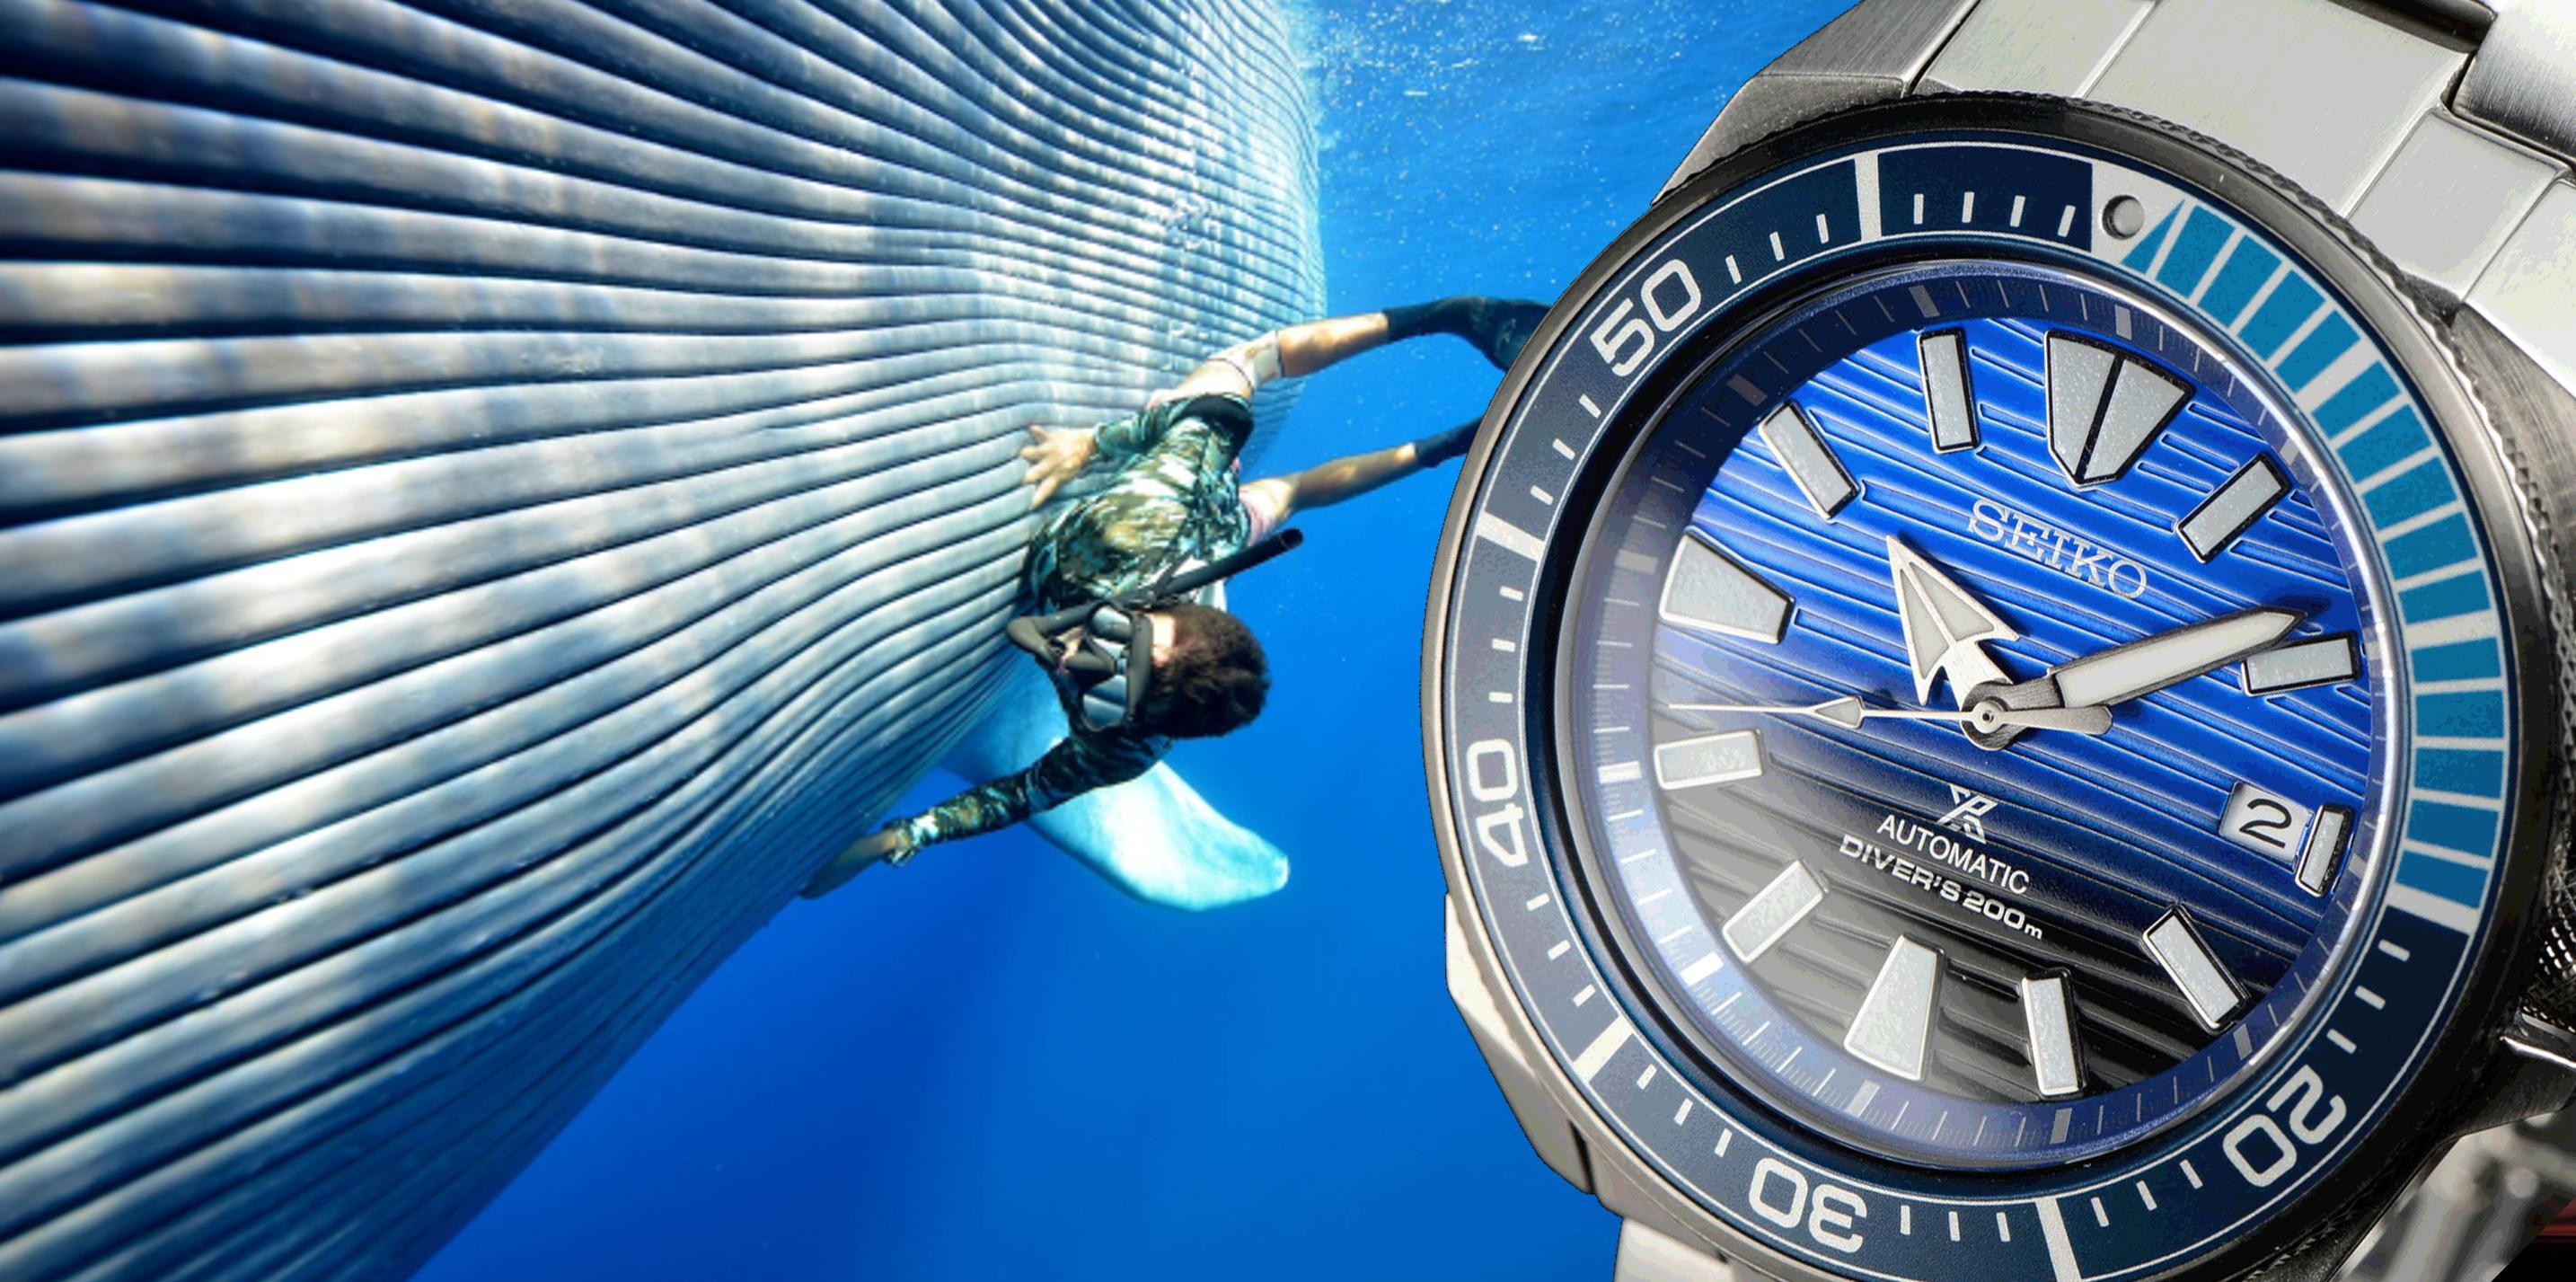 seiko-save-the-ocean-kek-balna.jpg